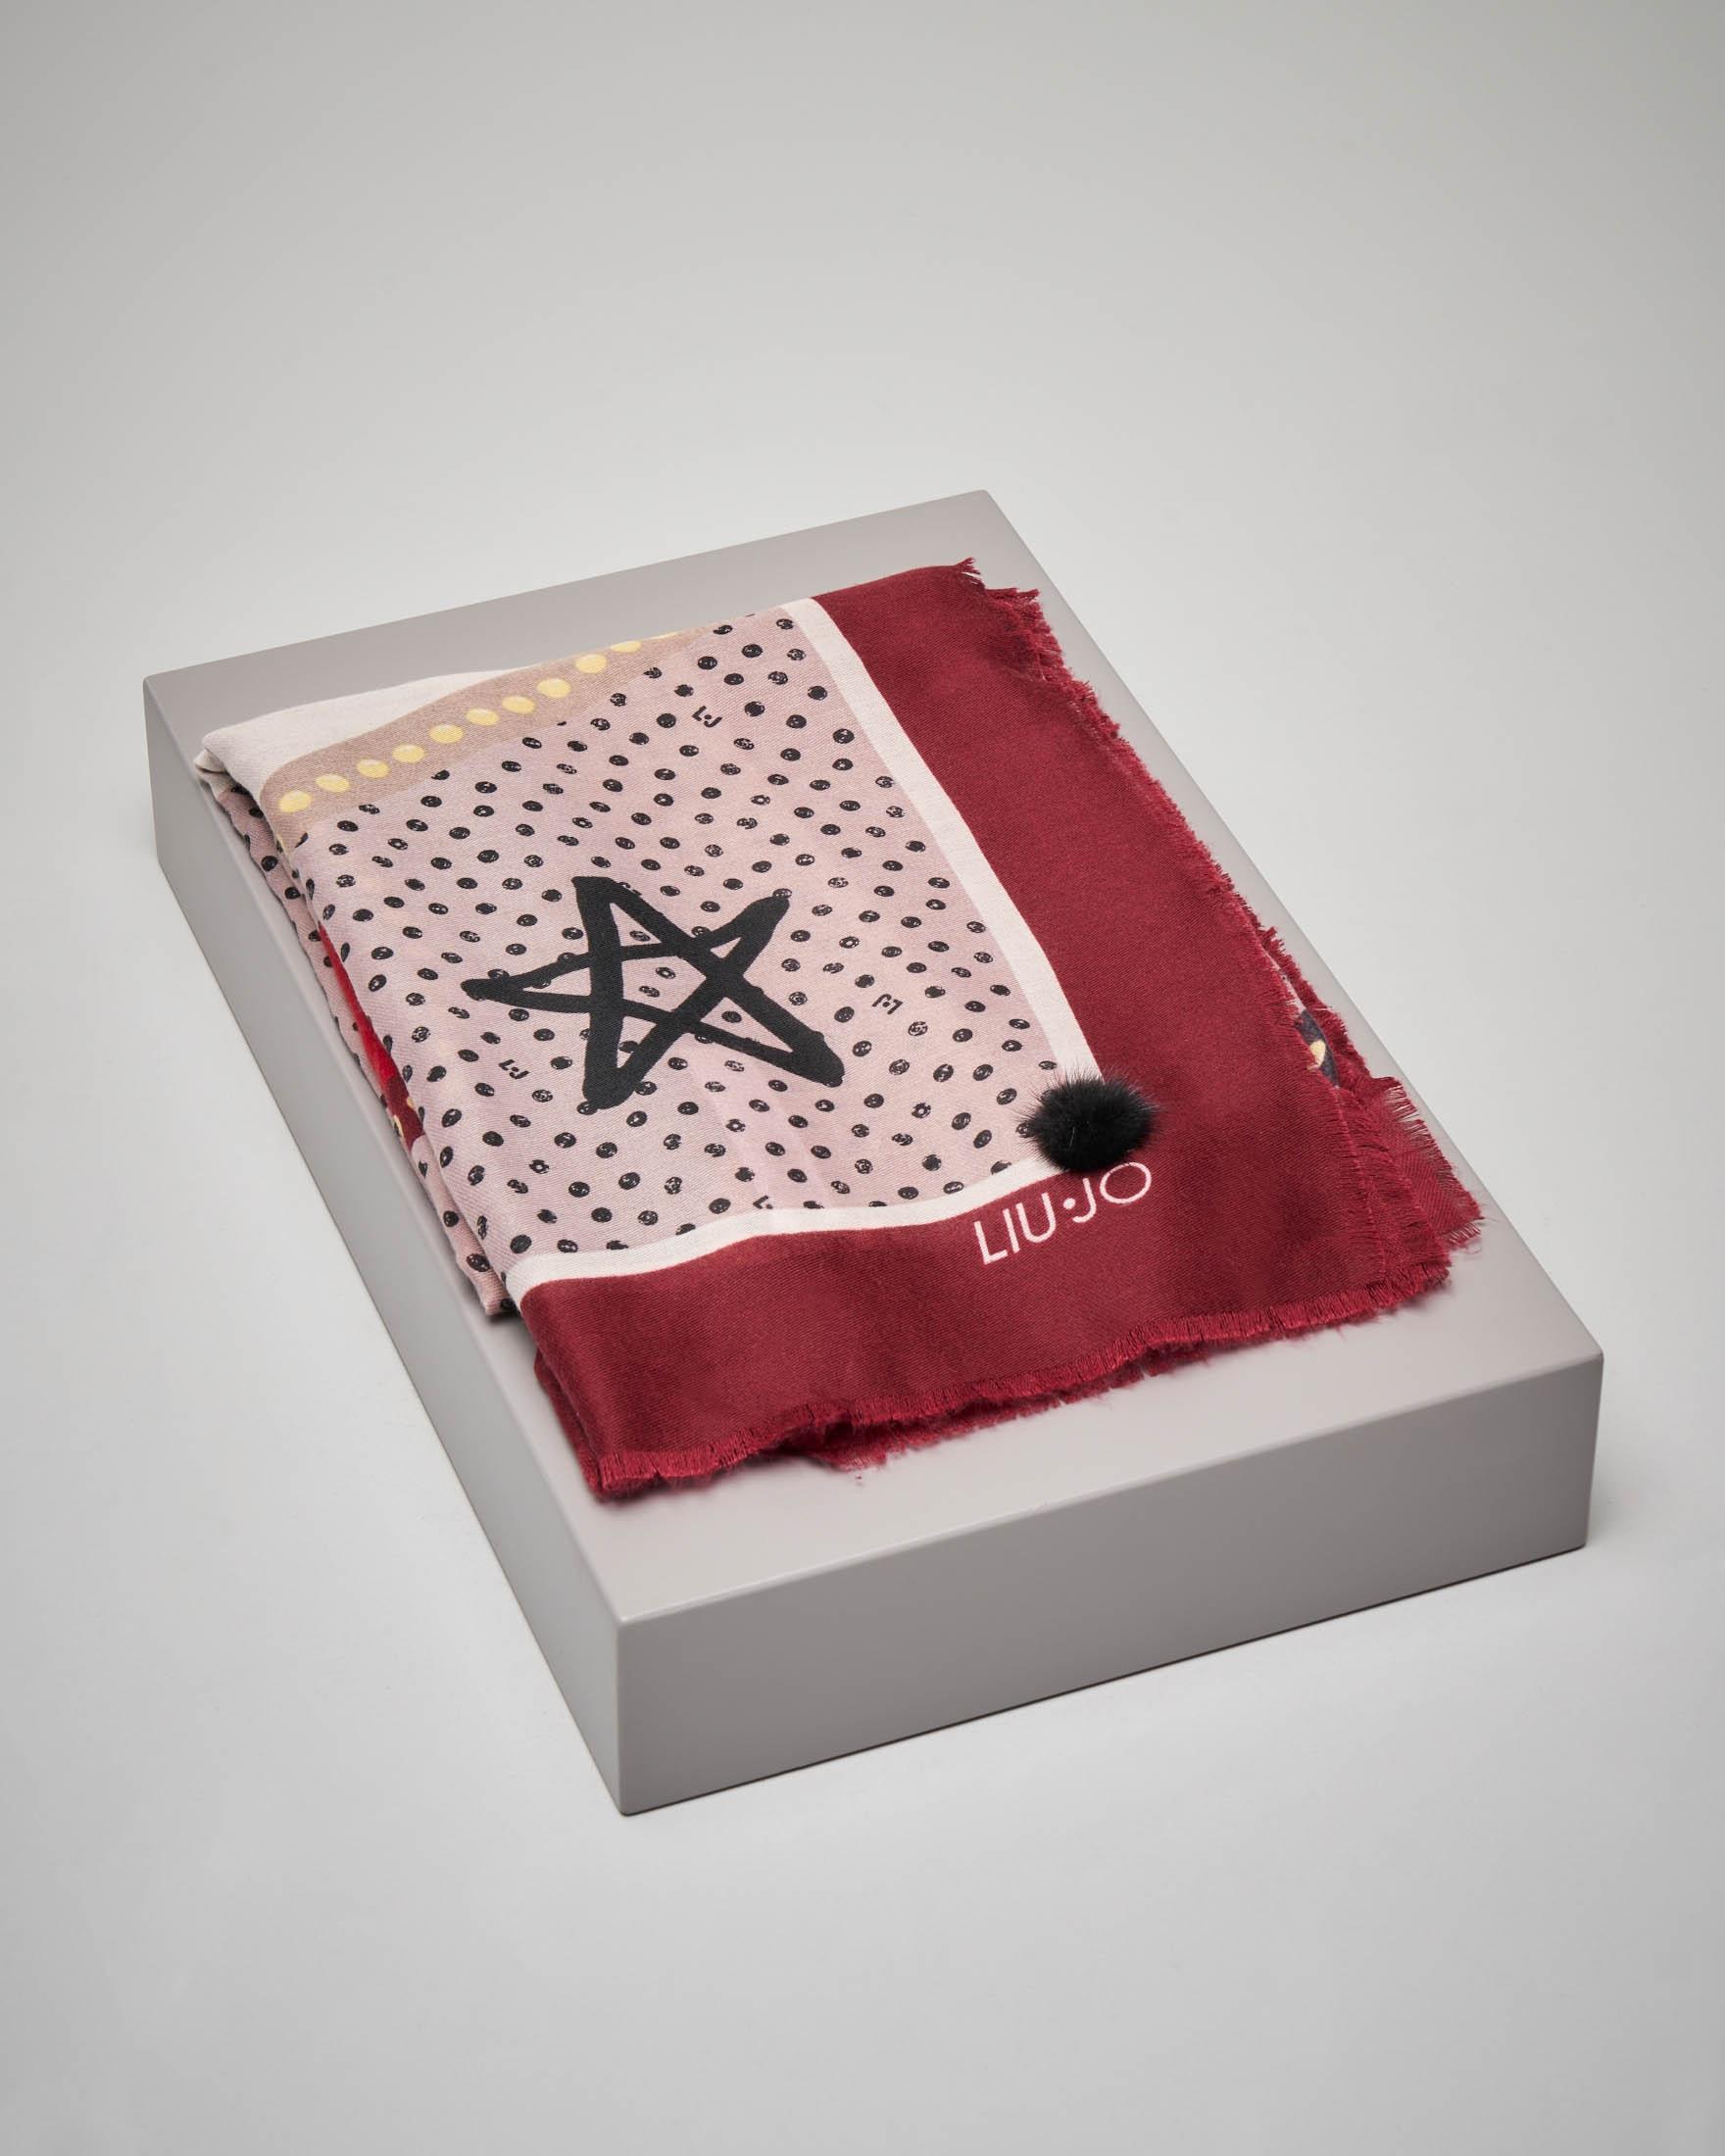 Maxi foulard fantasia logo con riquadro rosso e pon pon in pelliccia